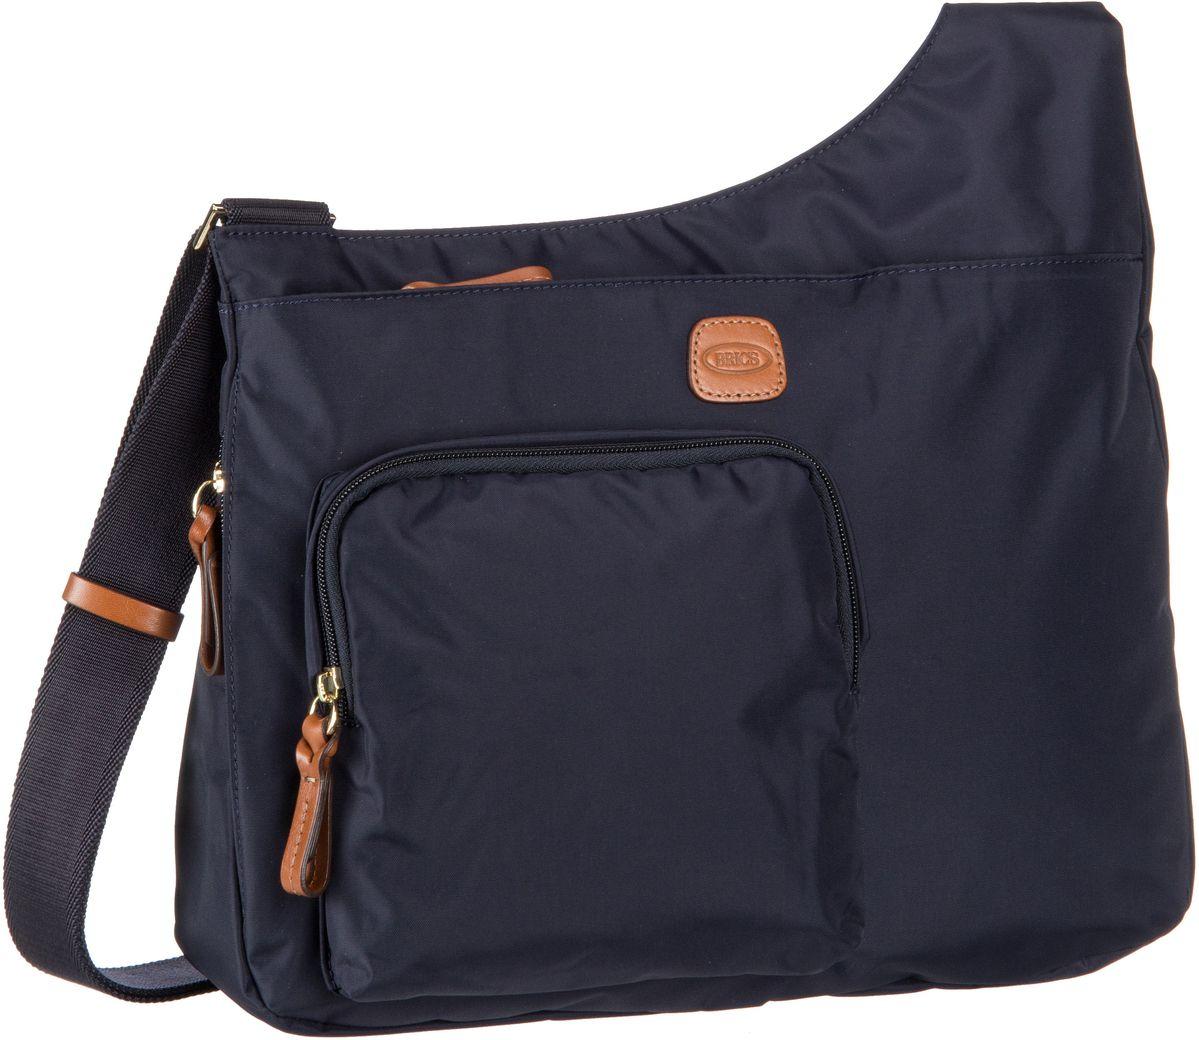 's Umhängetasche X-Bag Damentasche 42732 Oceano